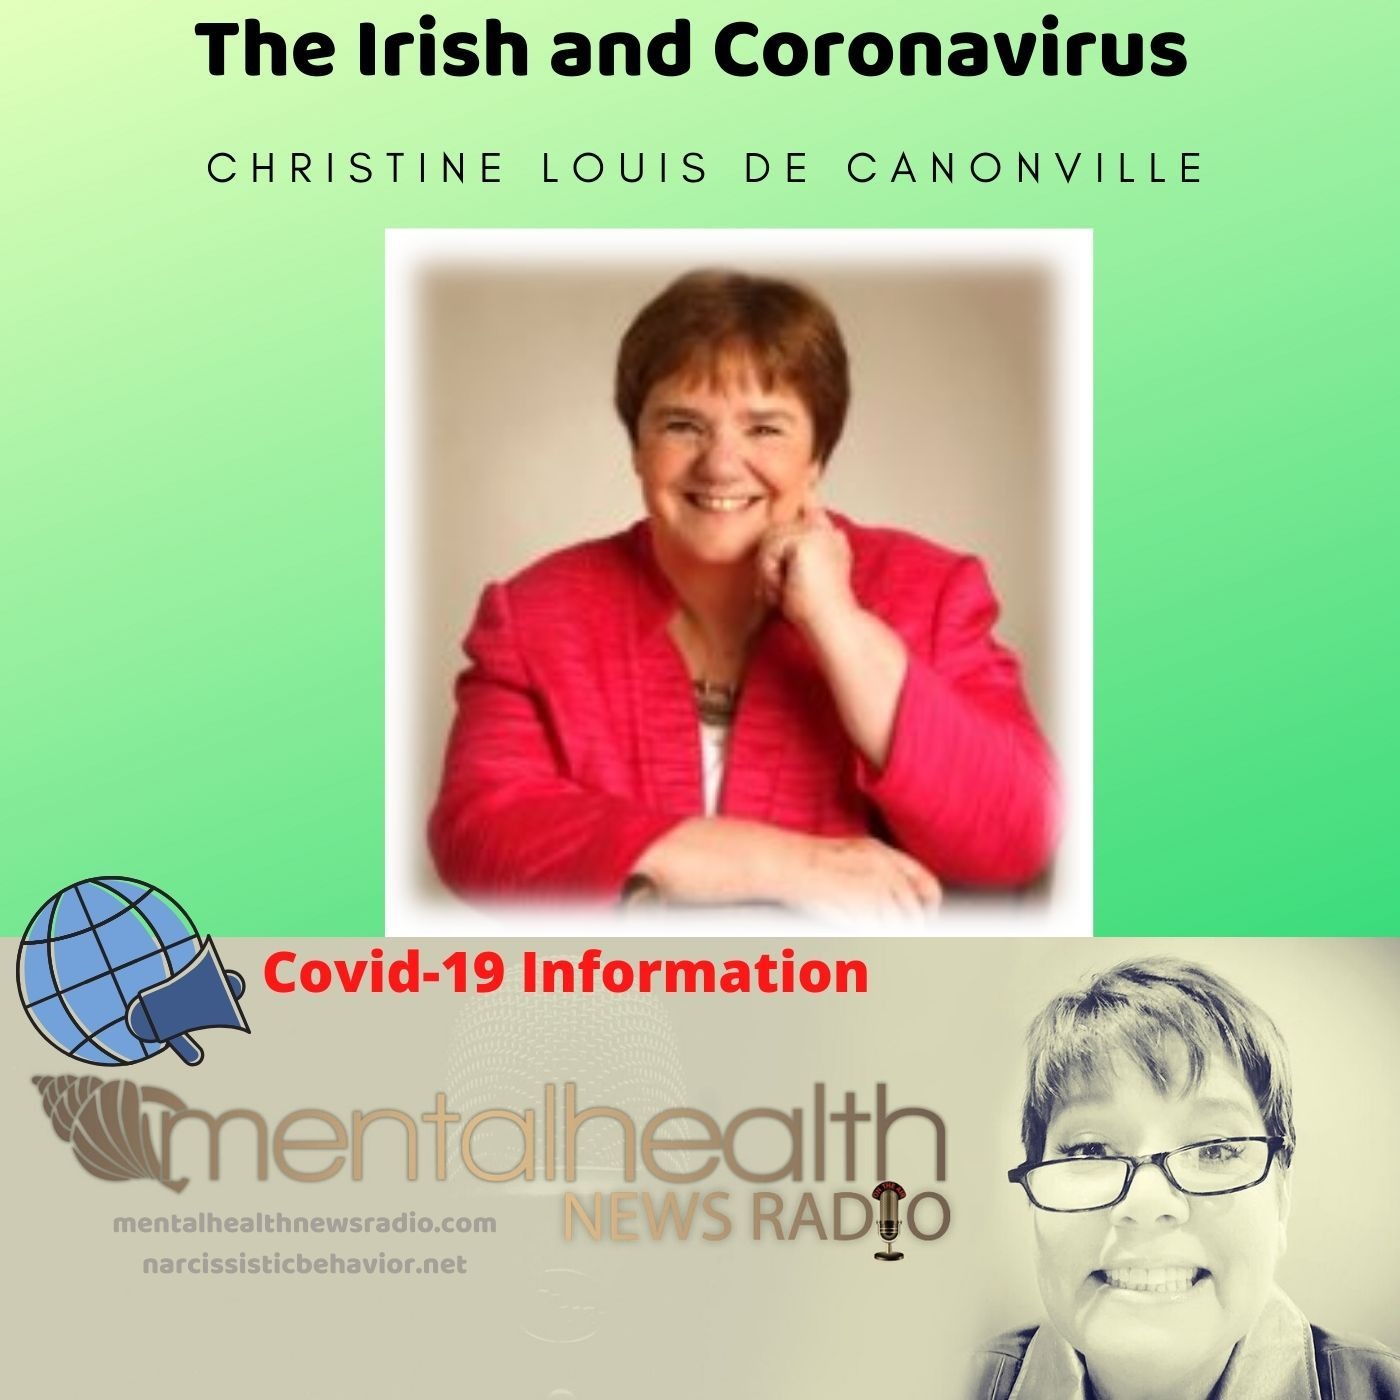 Mental Health News Radio - Christine Louis de Canonville on the Irish and Coronavirus